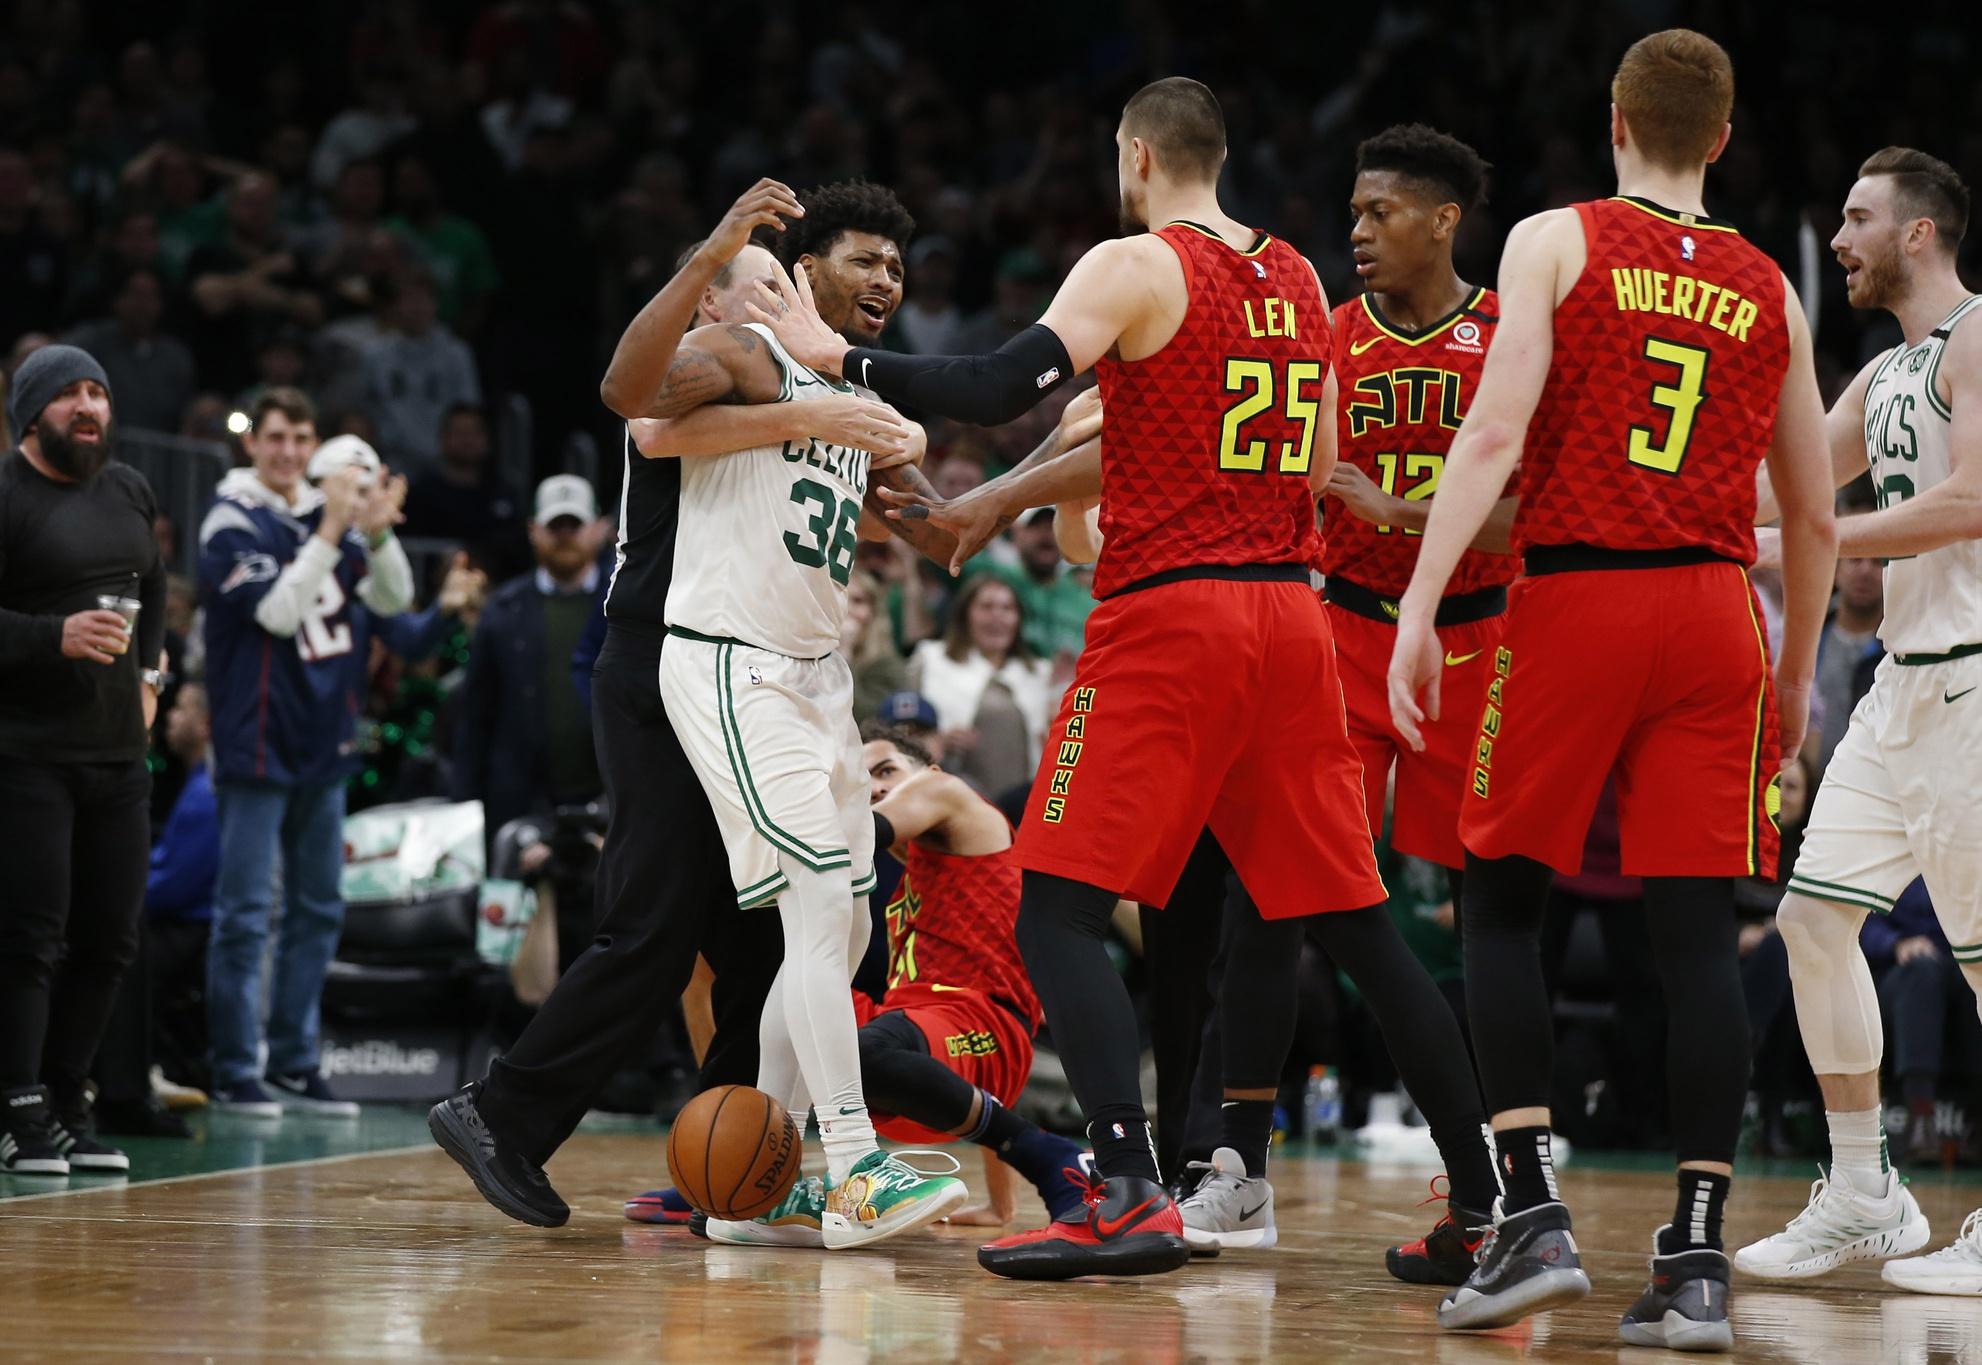 Report: Hawks interested in Marcus Smart, Celtics eyeing Magic's Fournier